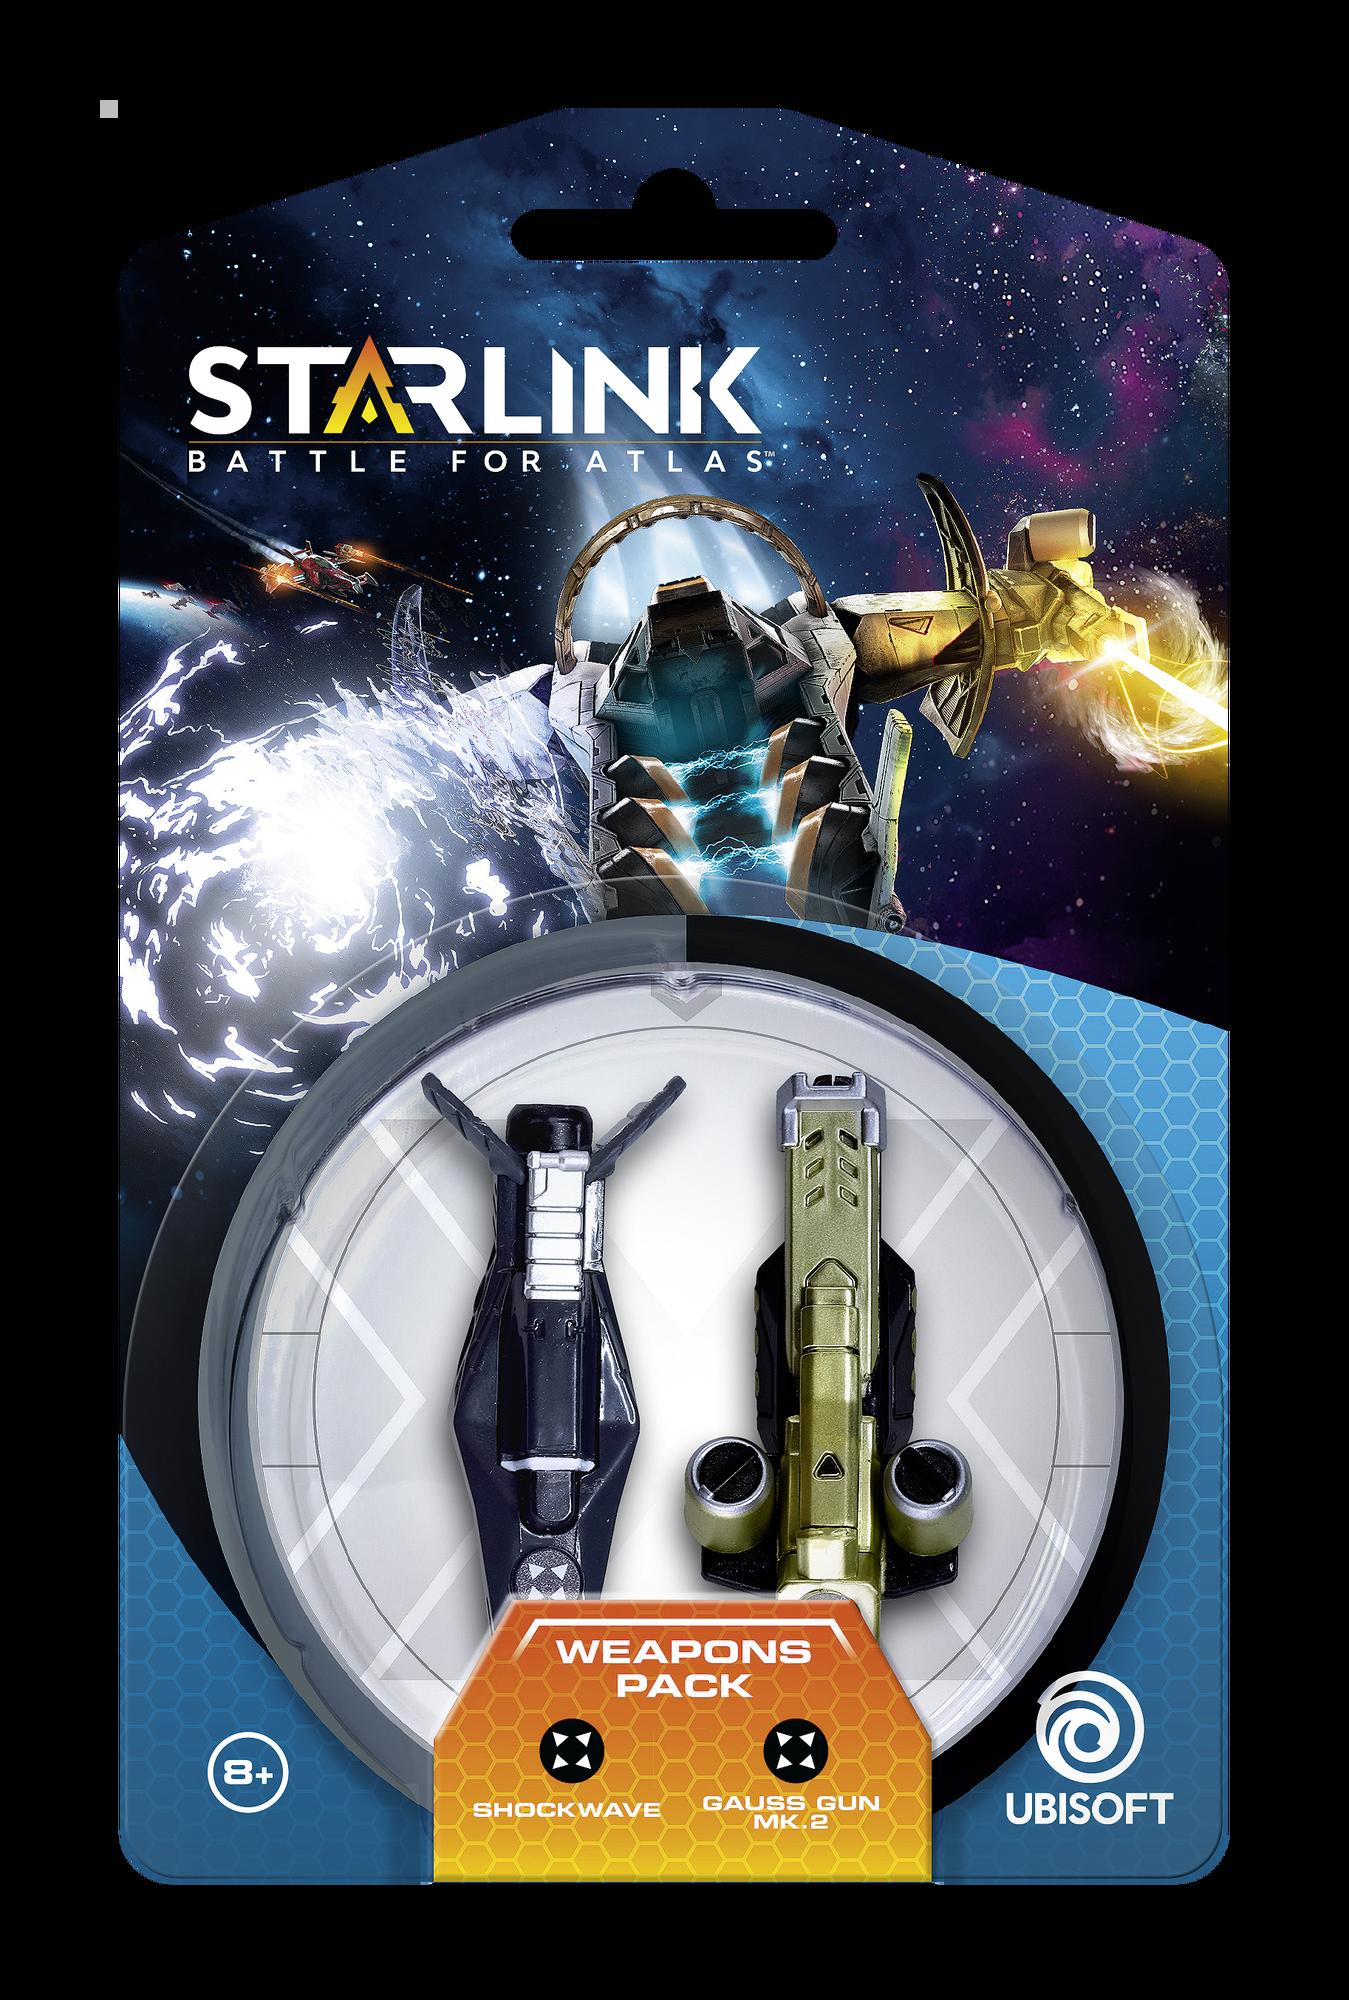 Starlink: Battle for Atlas - Armi Pack (Shockwave | Gauss Gun Mk.2)